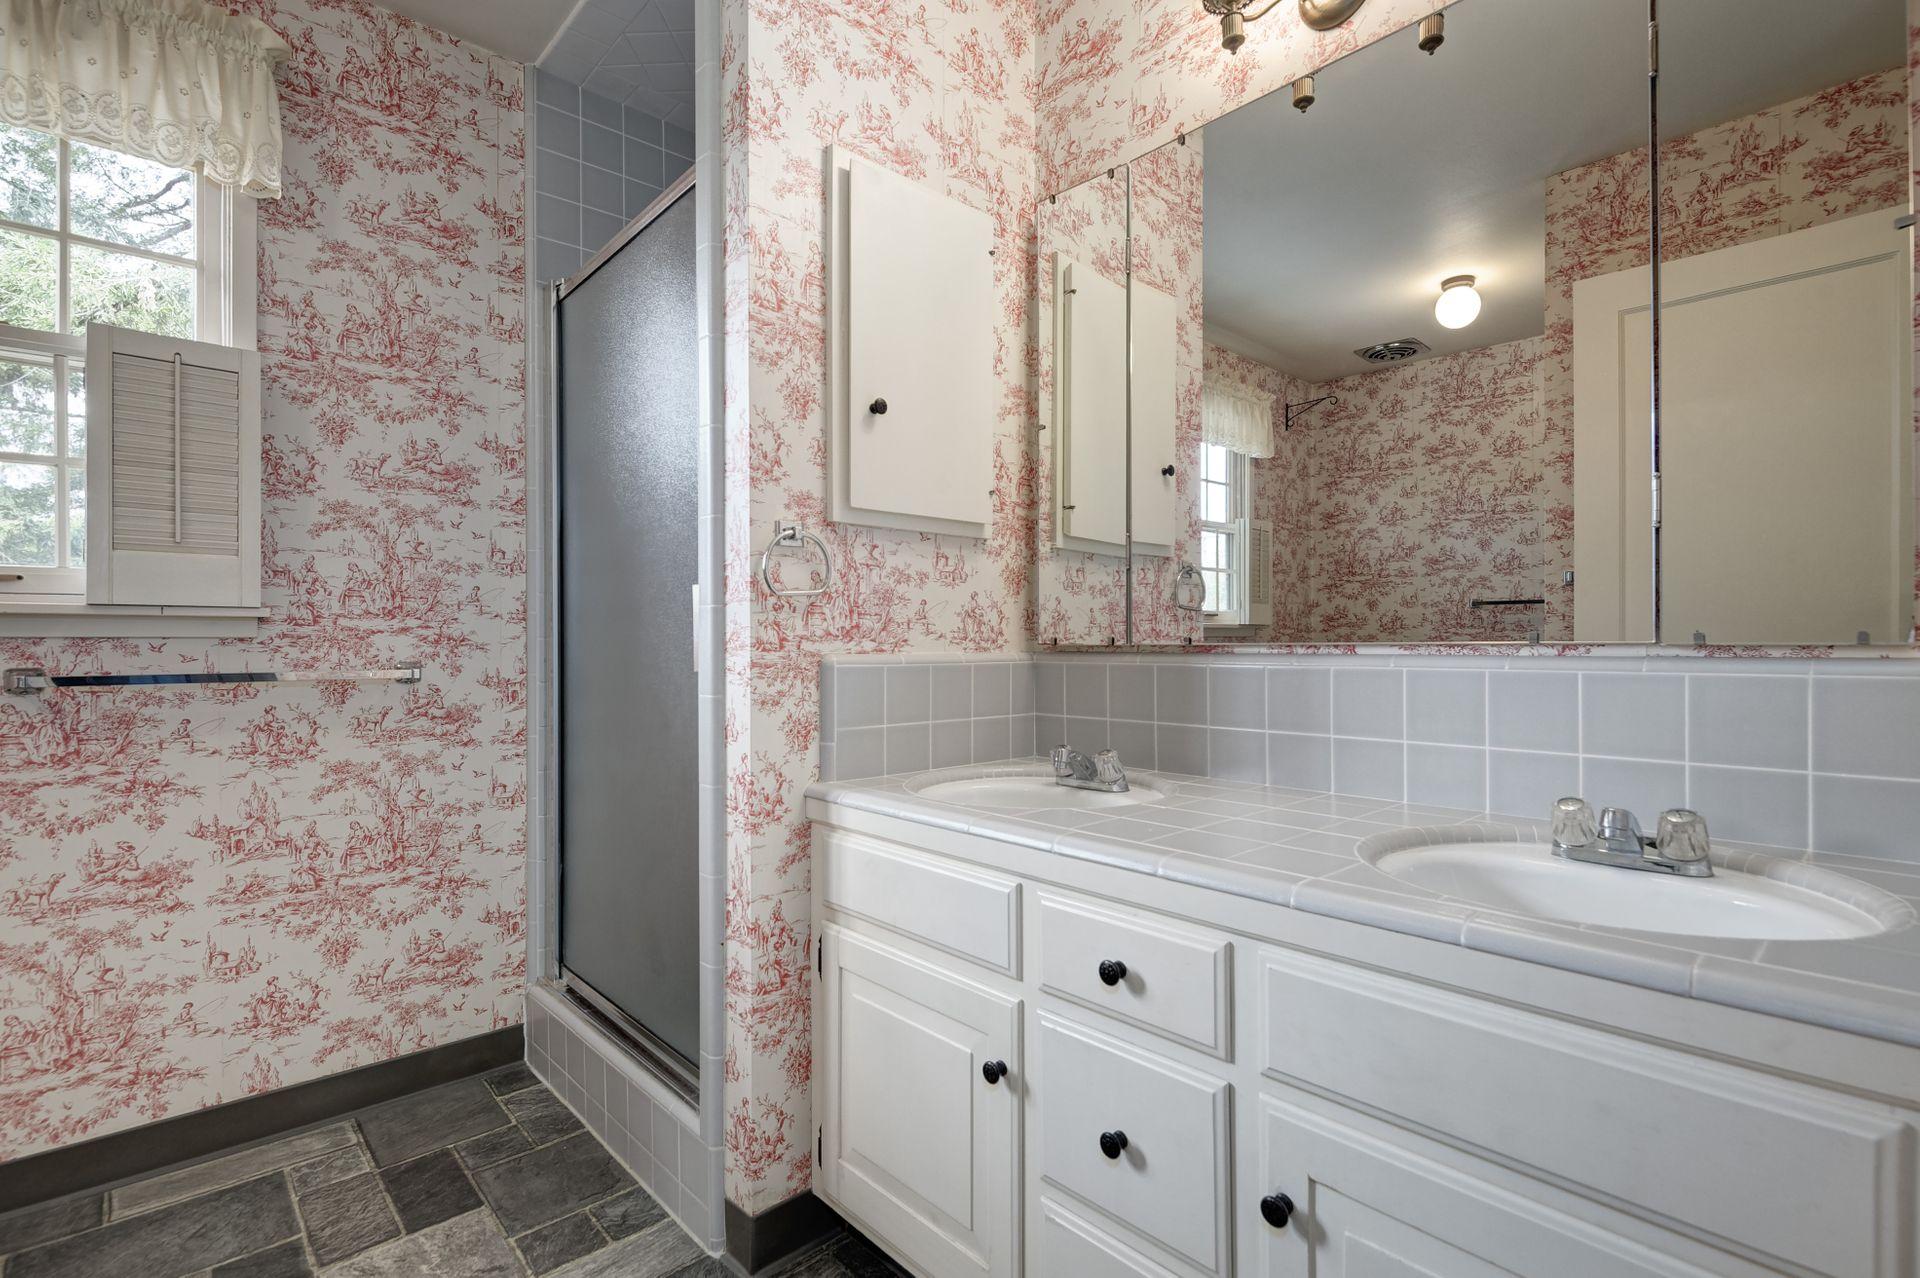 15_Bathroom.jpg